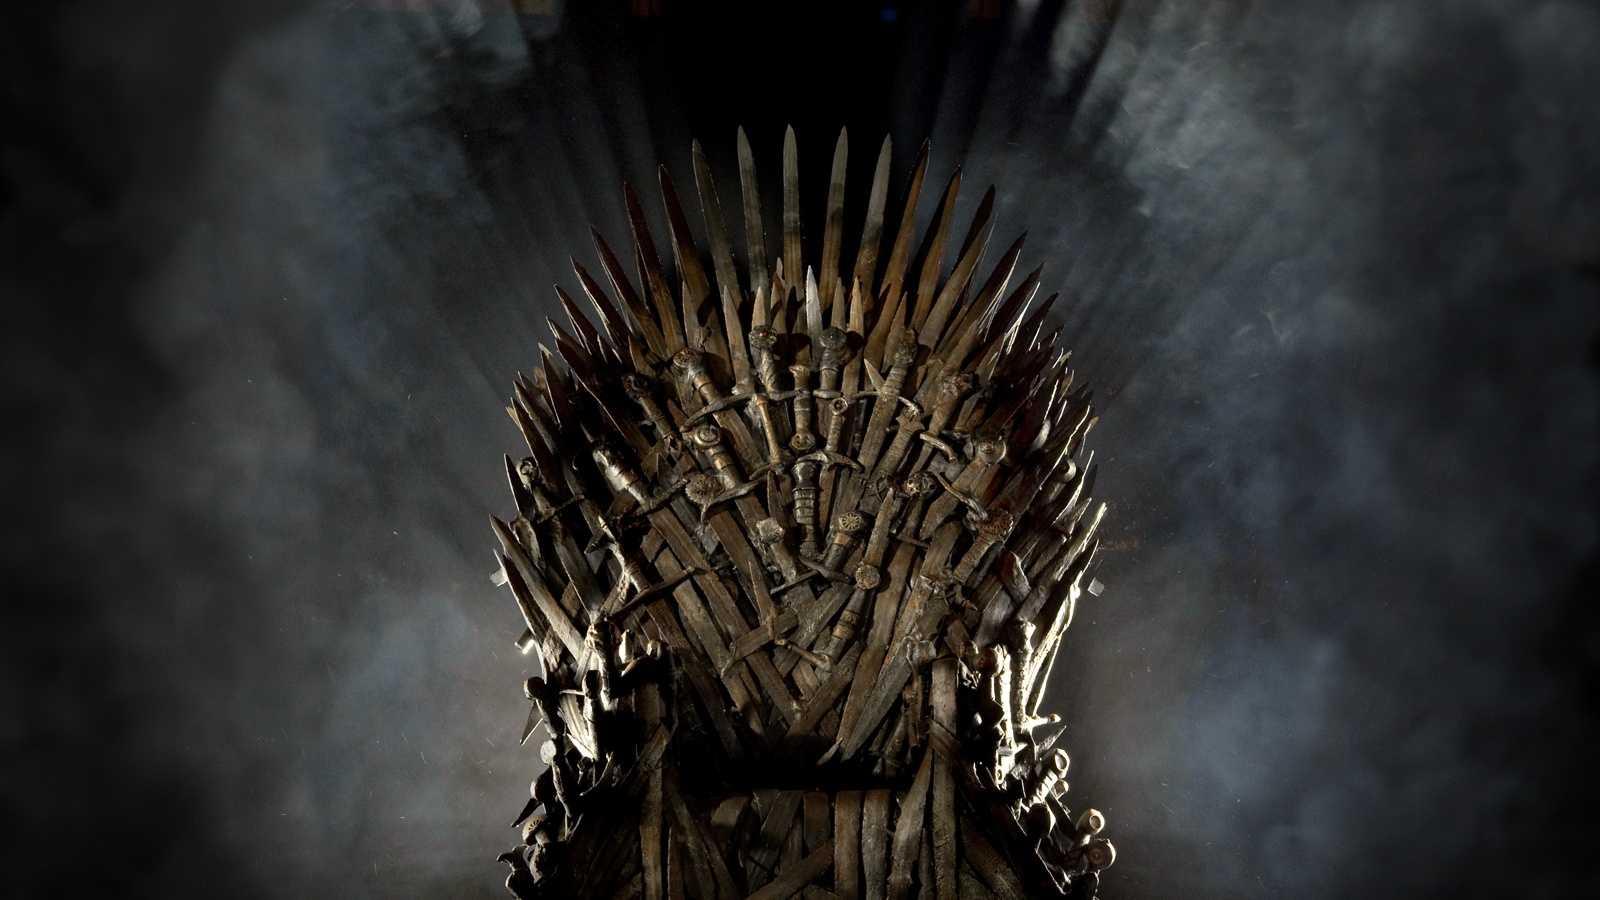 wallpaper-iron-throne-1600.jpg